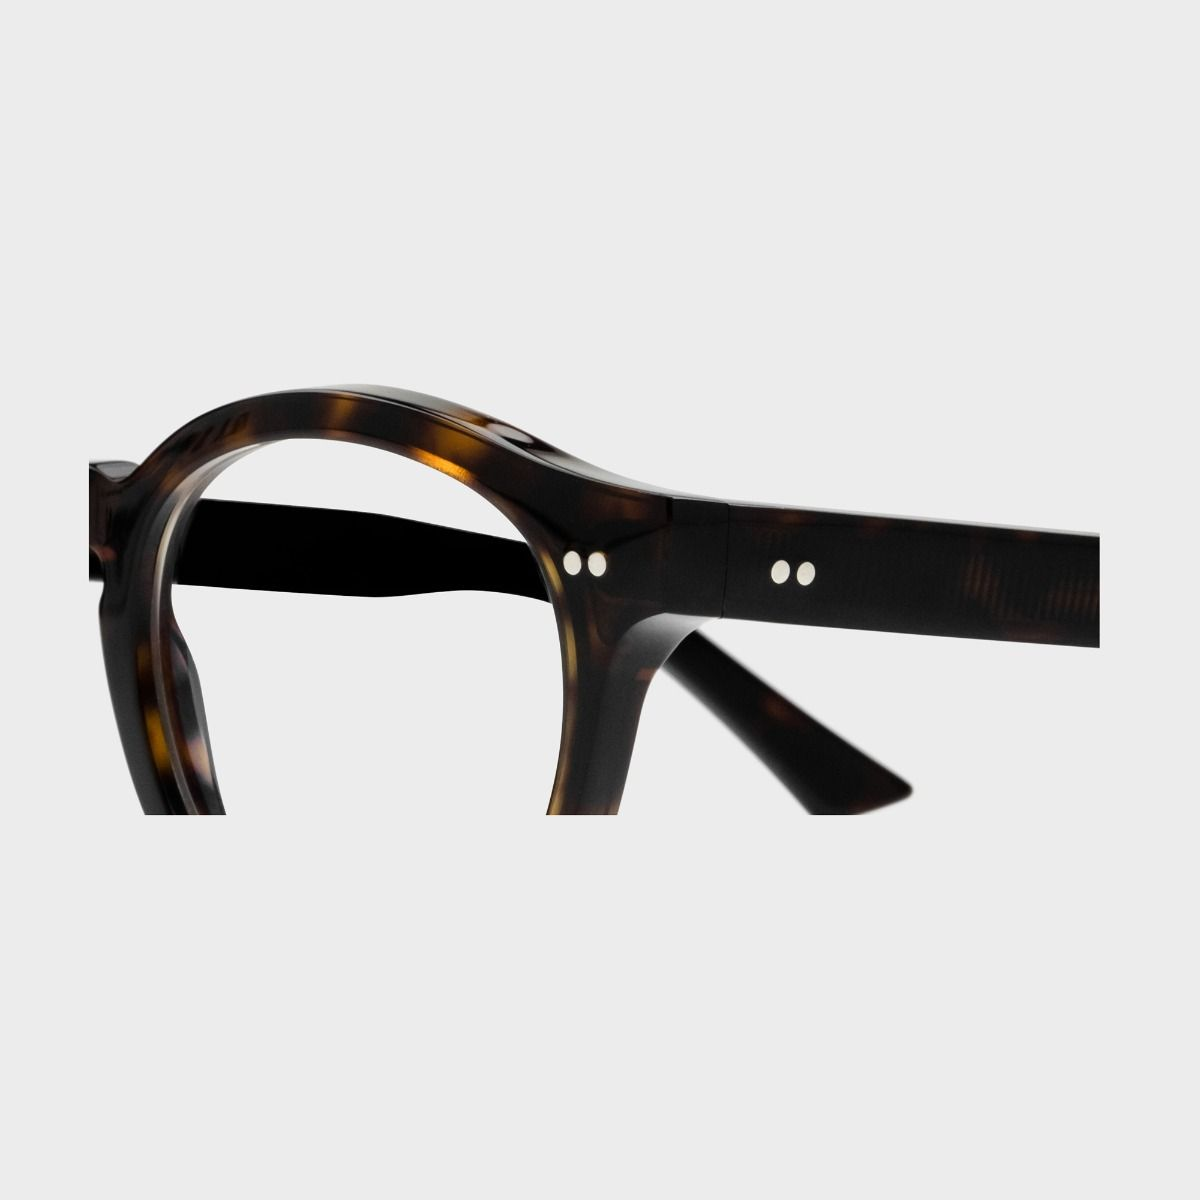 1378 Blue Light Filter Optical Round Glasses-Dusky Turtle